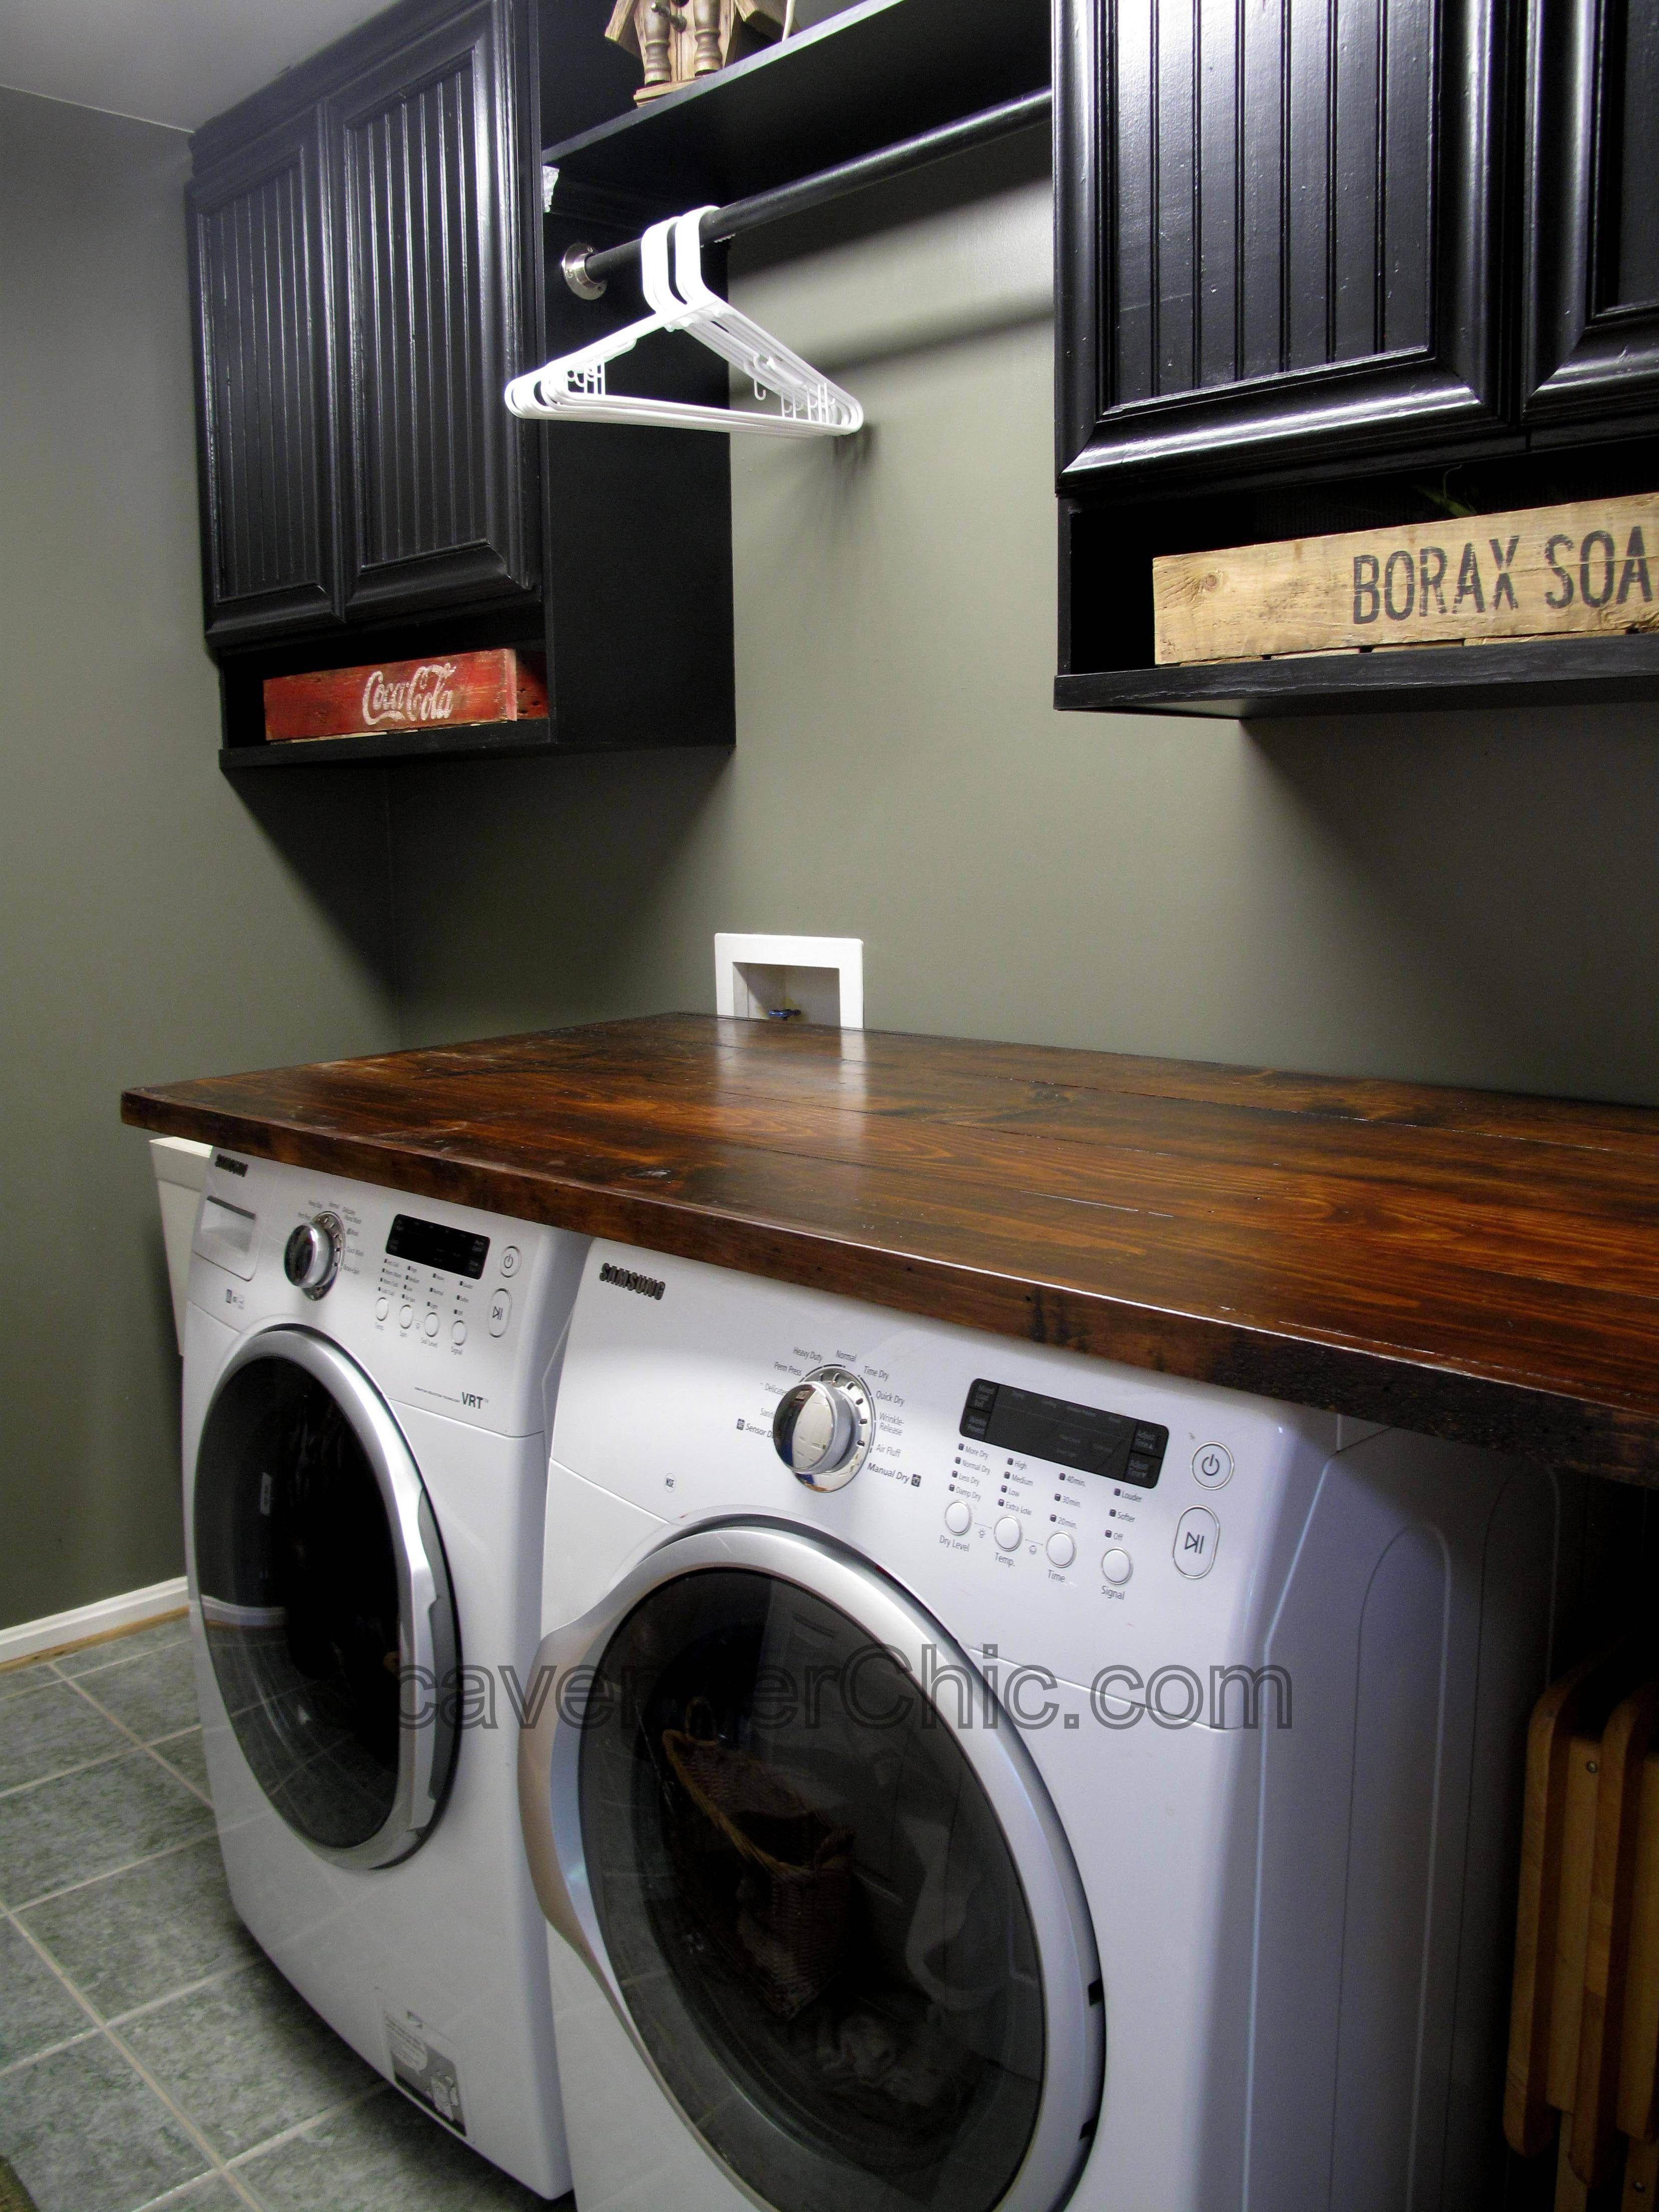 Diy Wood Countertop Laundry Room Pinterest Diy Wood